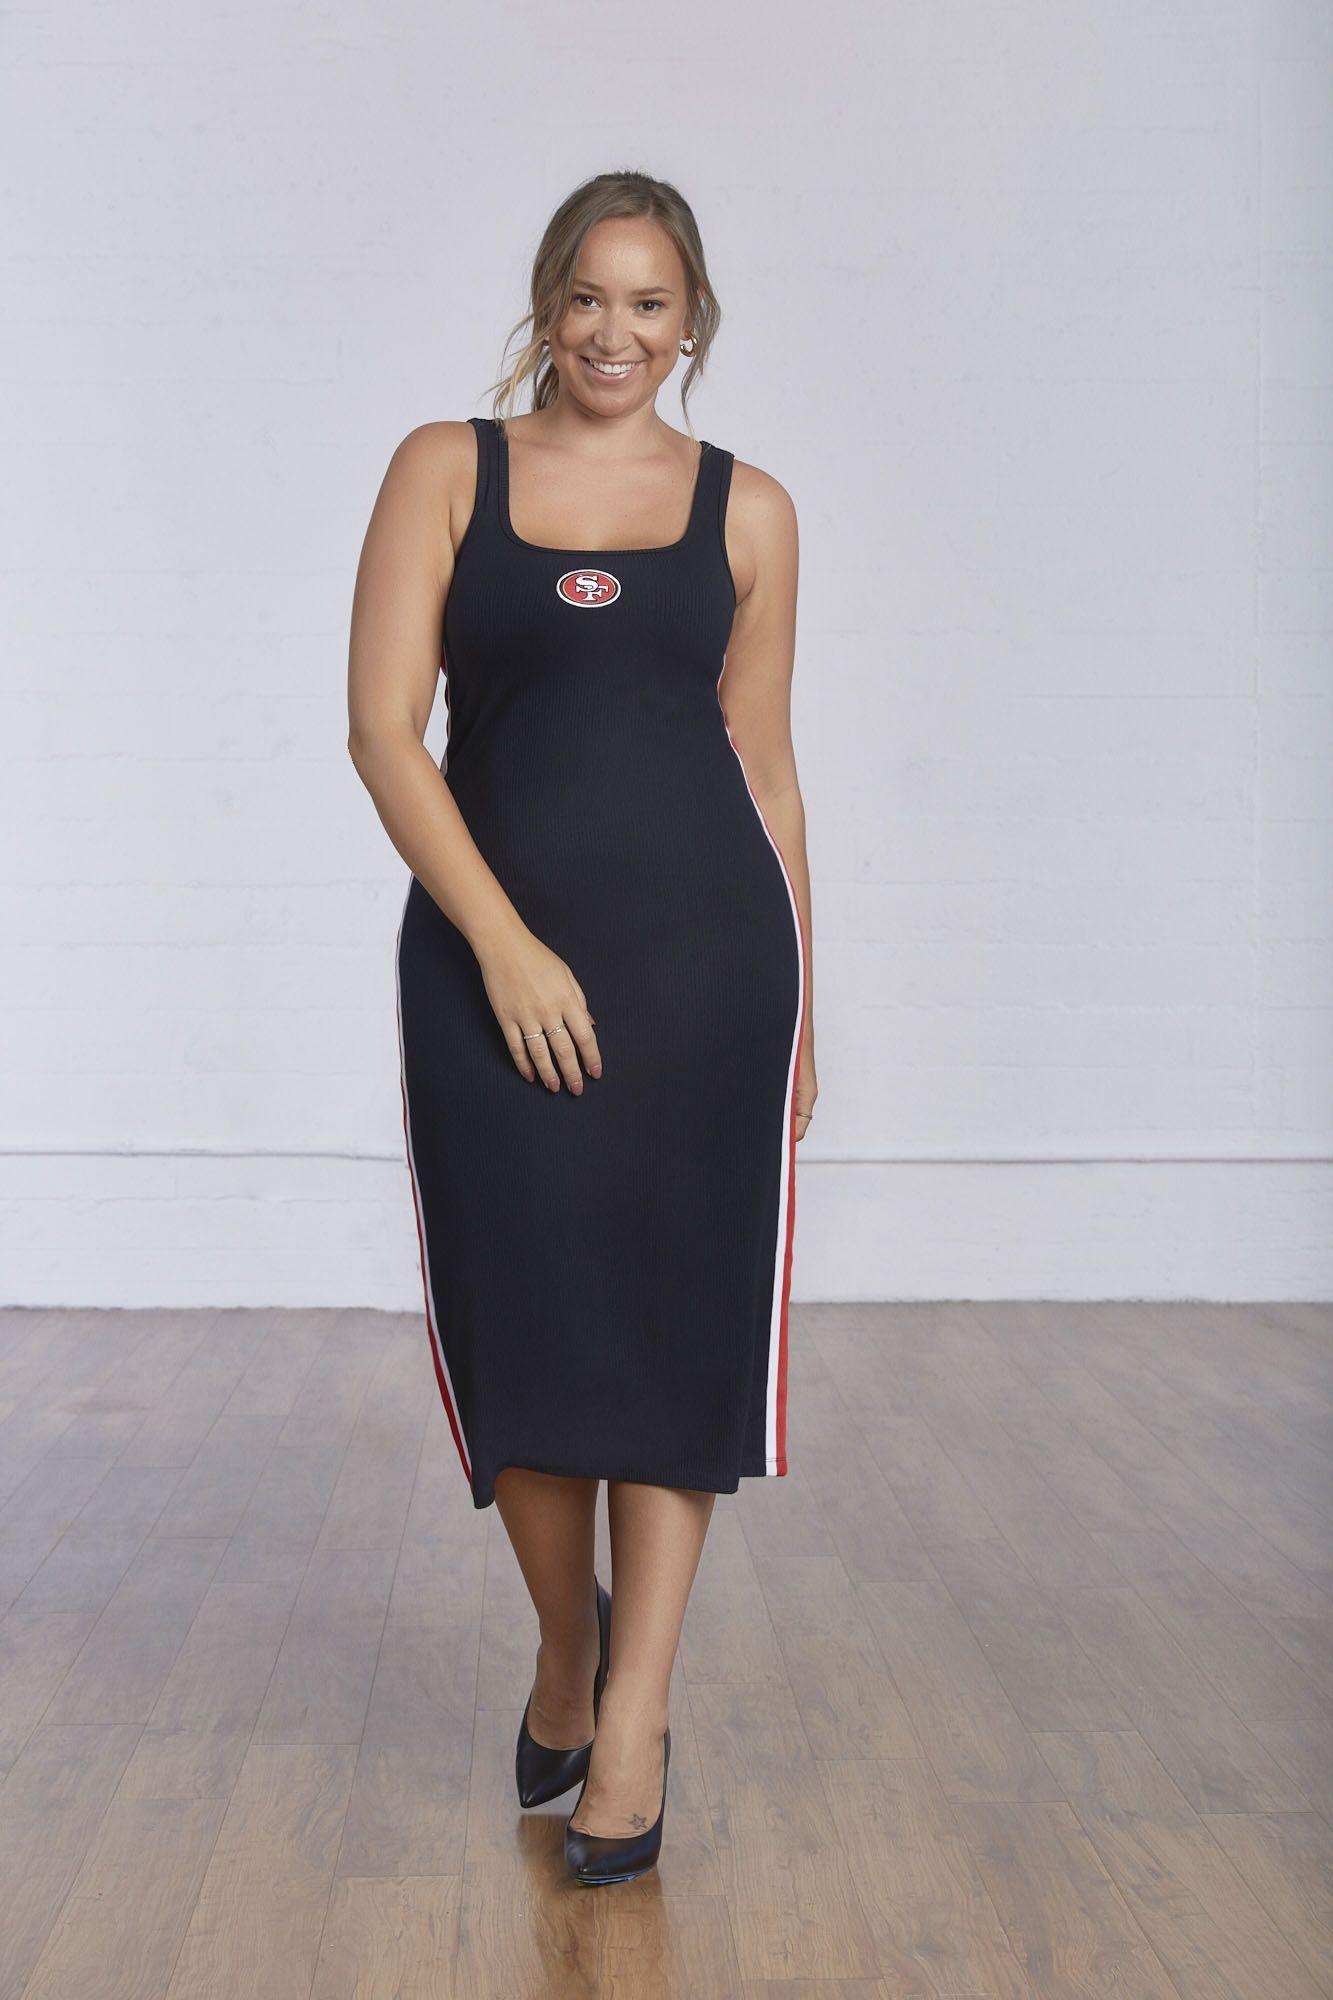 San Francisco 49ers Style Maxi Tank Dress Black Maxi Dress Dresses For Work [ 2000 x 1333 Pixel ]